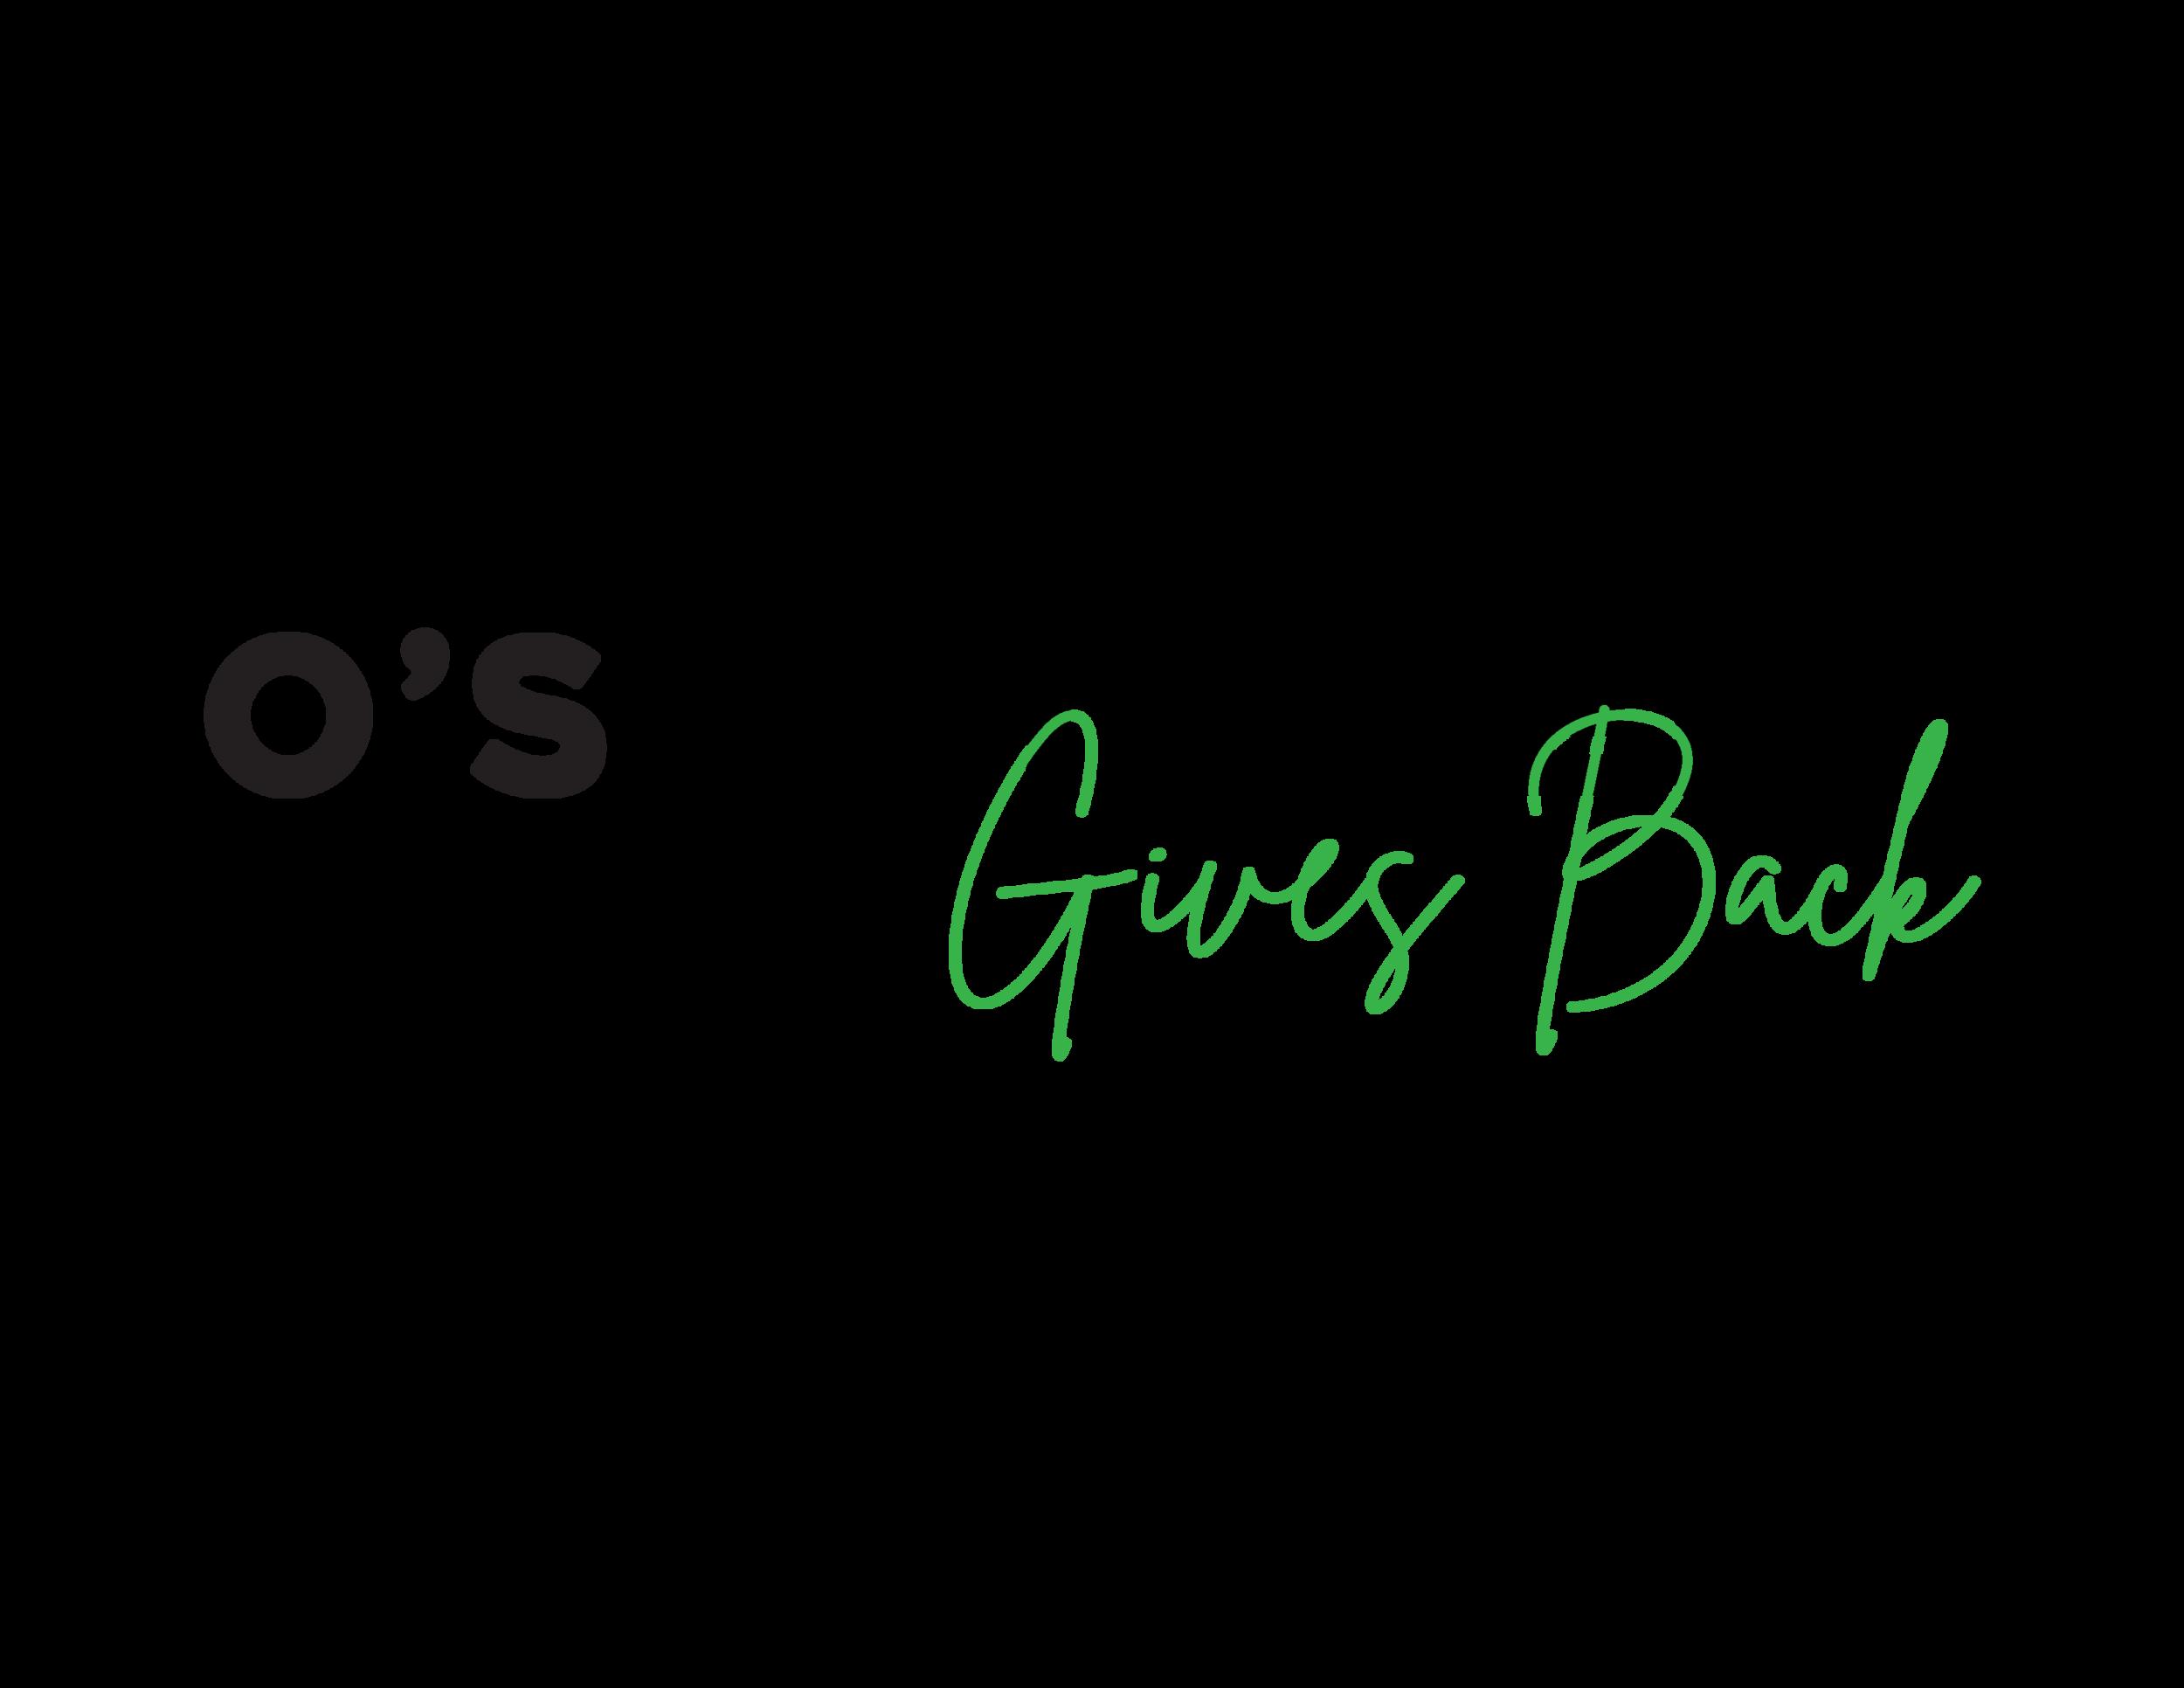 os-giveback-logo-01.png